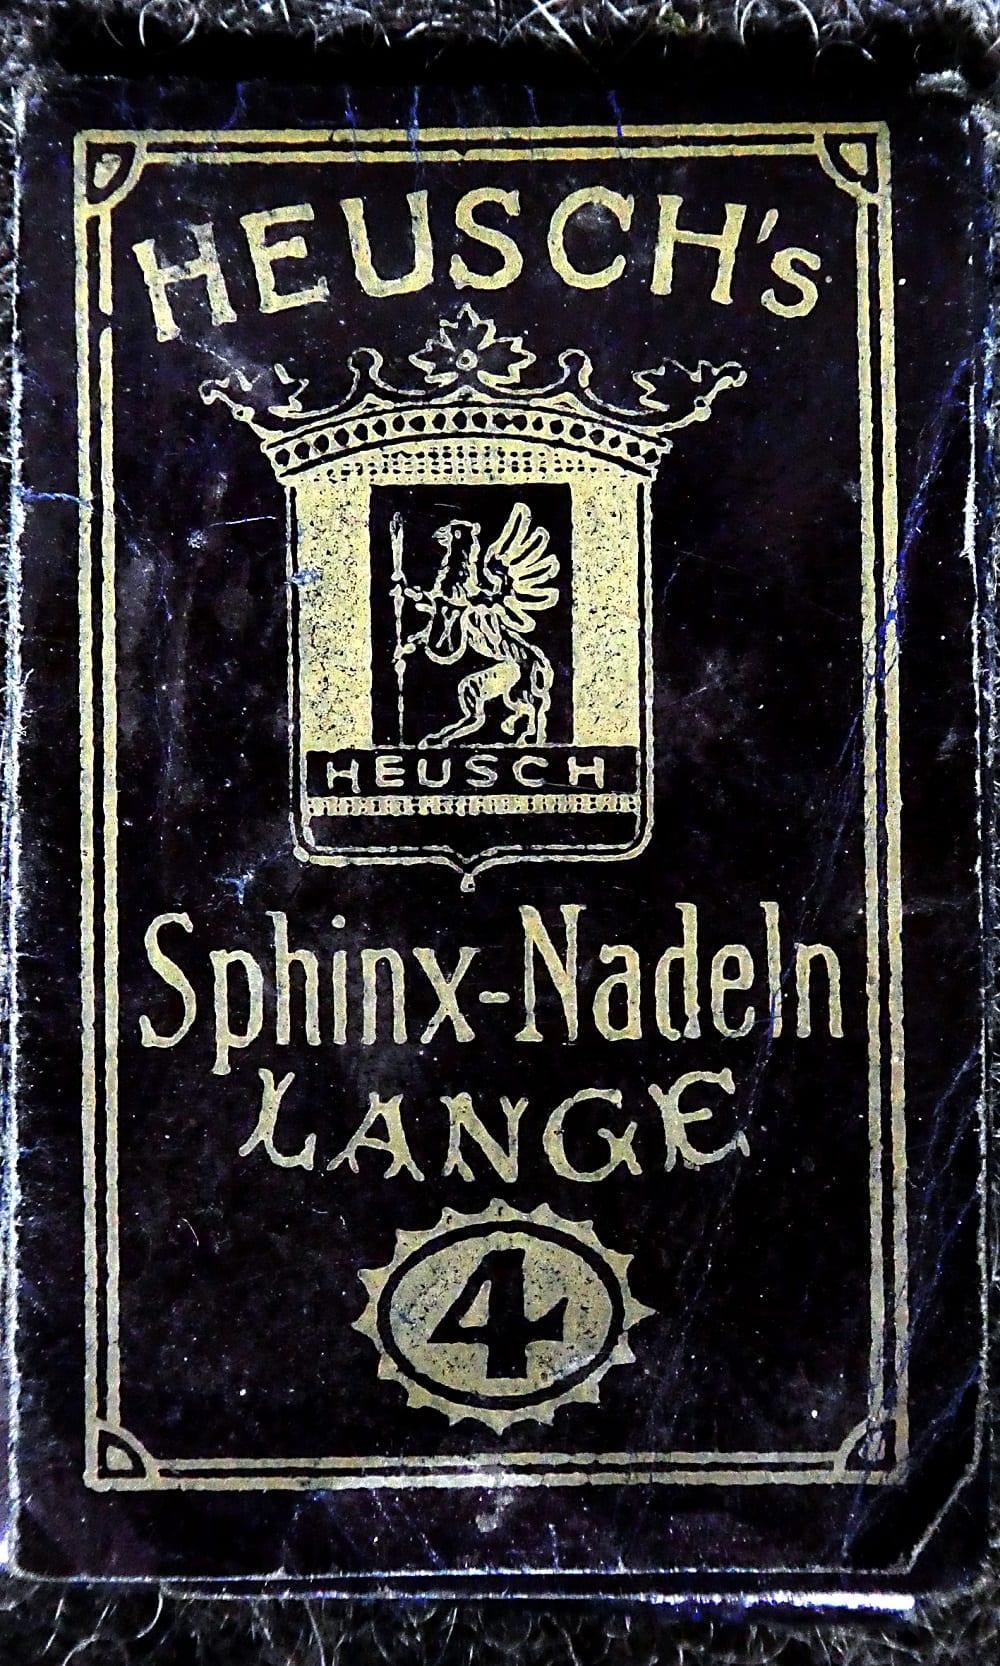 Nadelbrief Sphinx- Nadeln Lange 4 Heusch Aachen ca. 1950